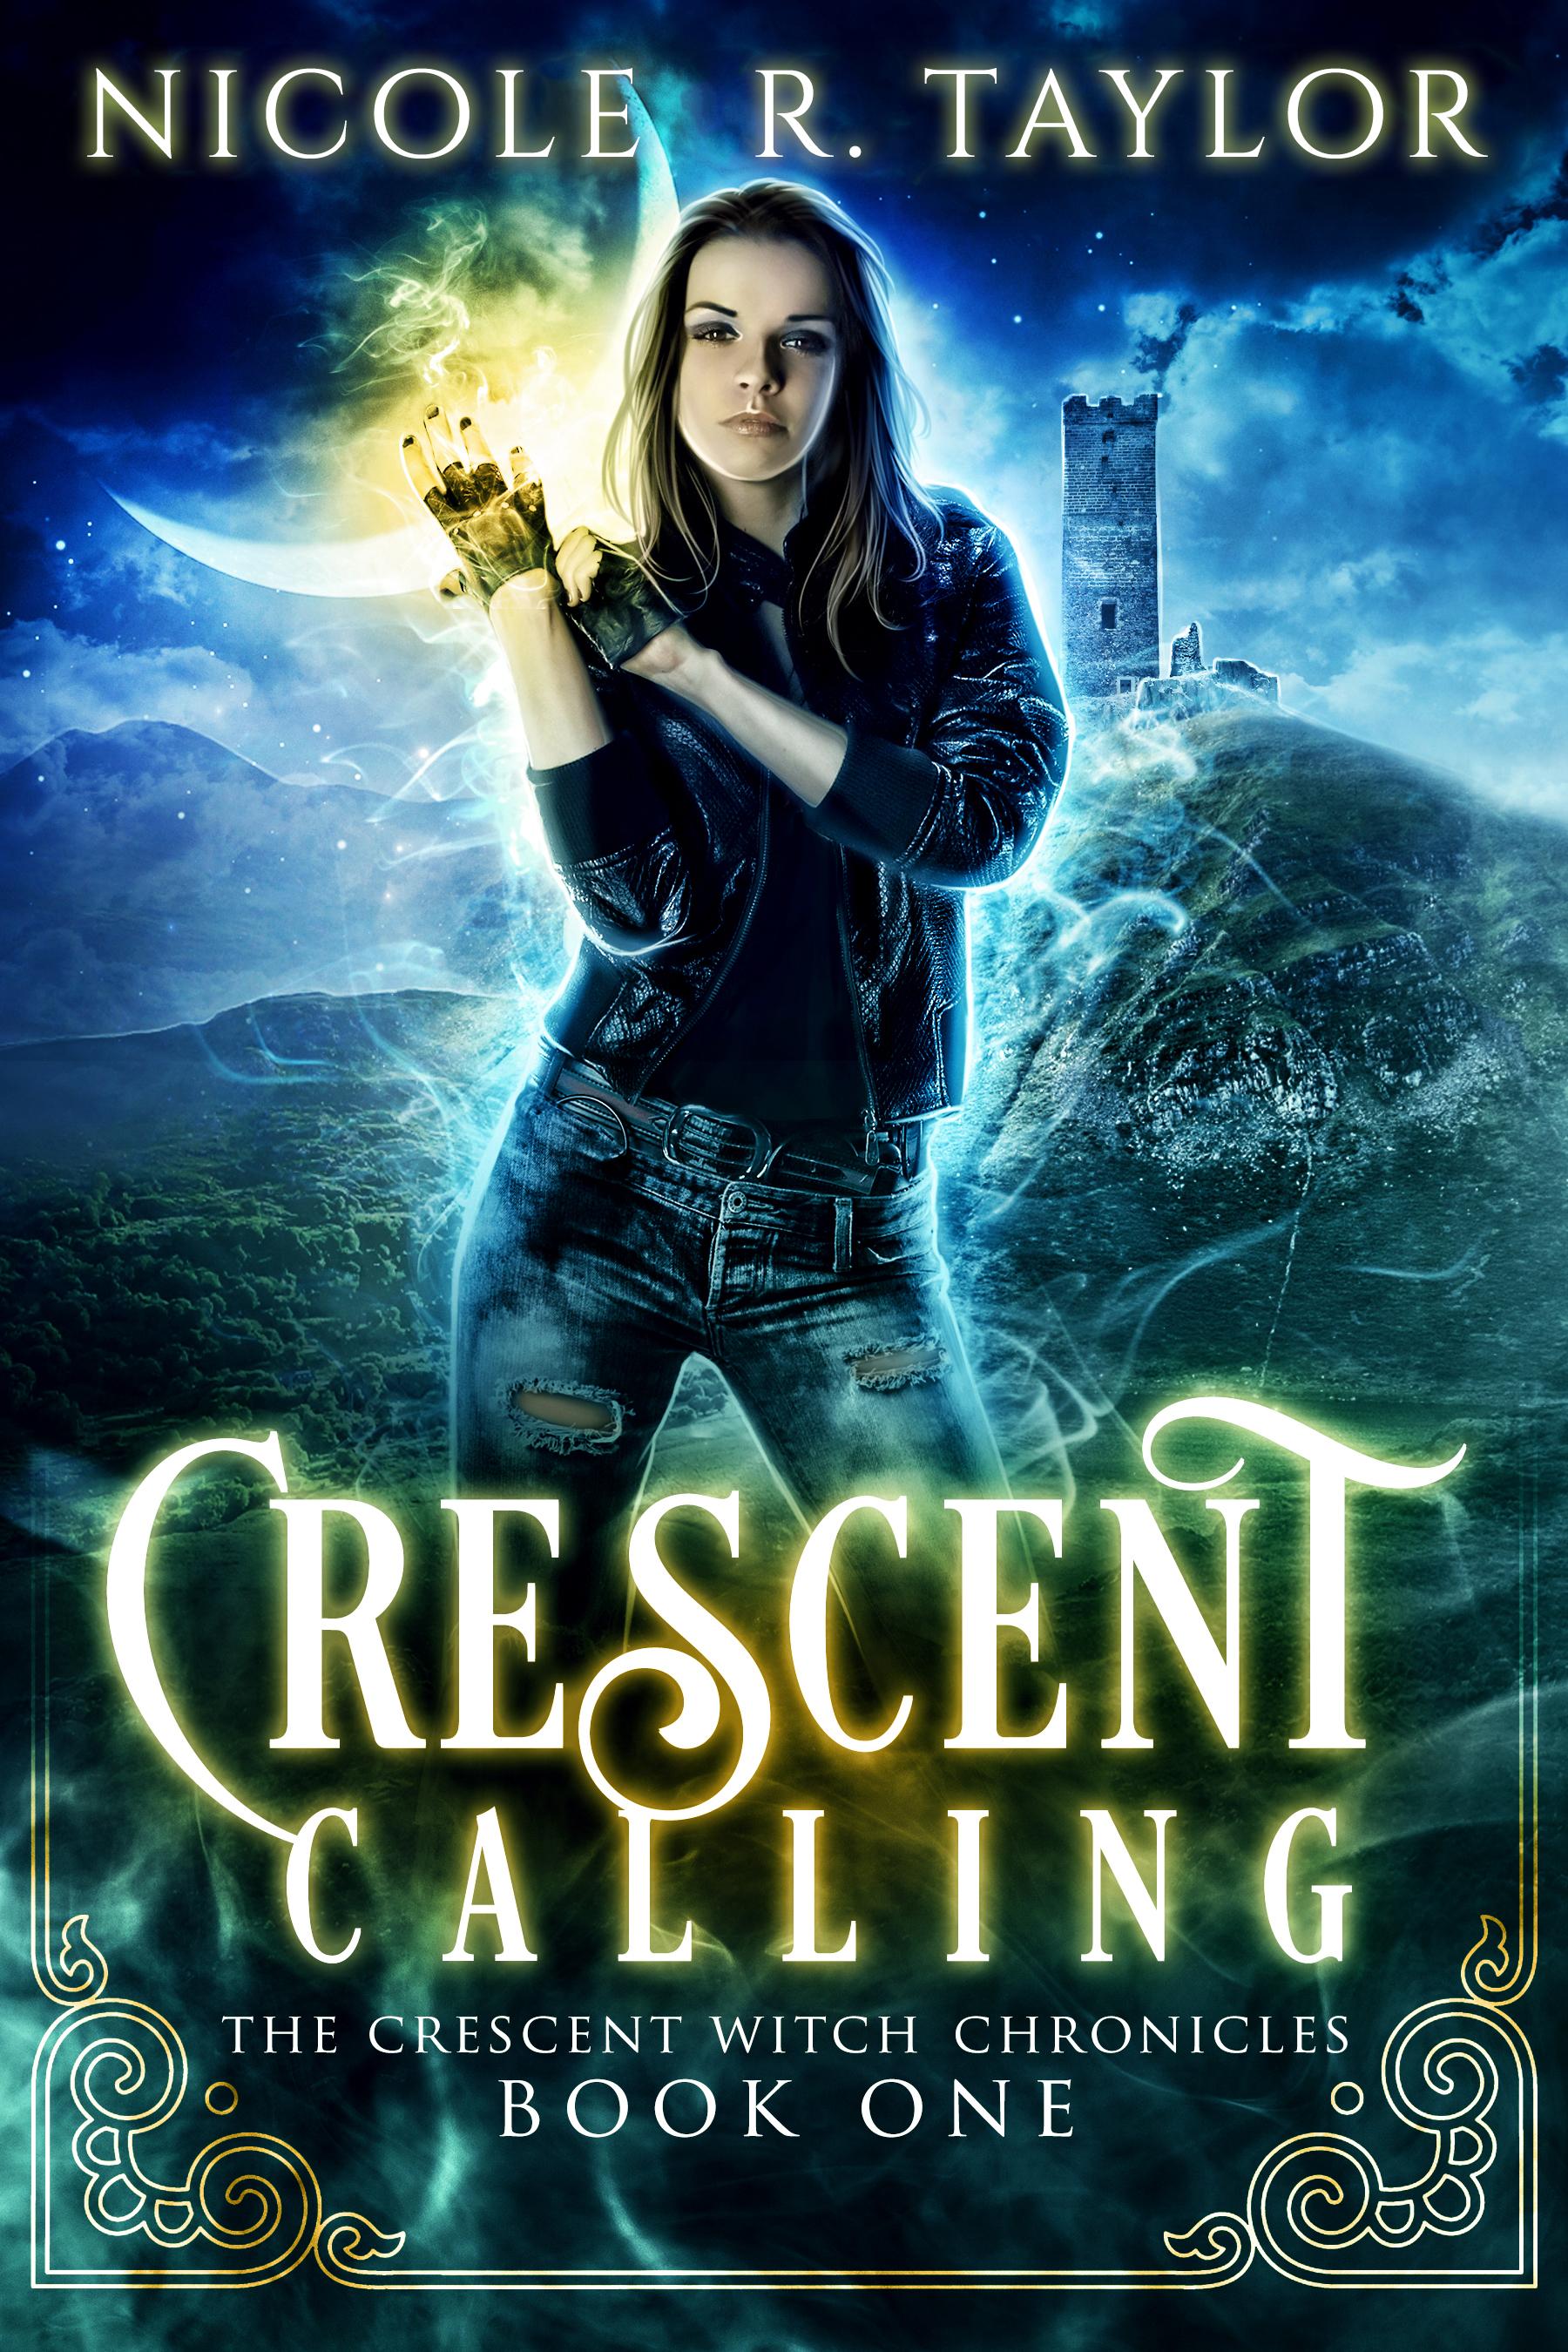 Crescent Calling (sst-ccclxiv)